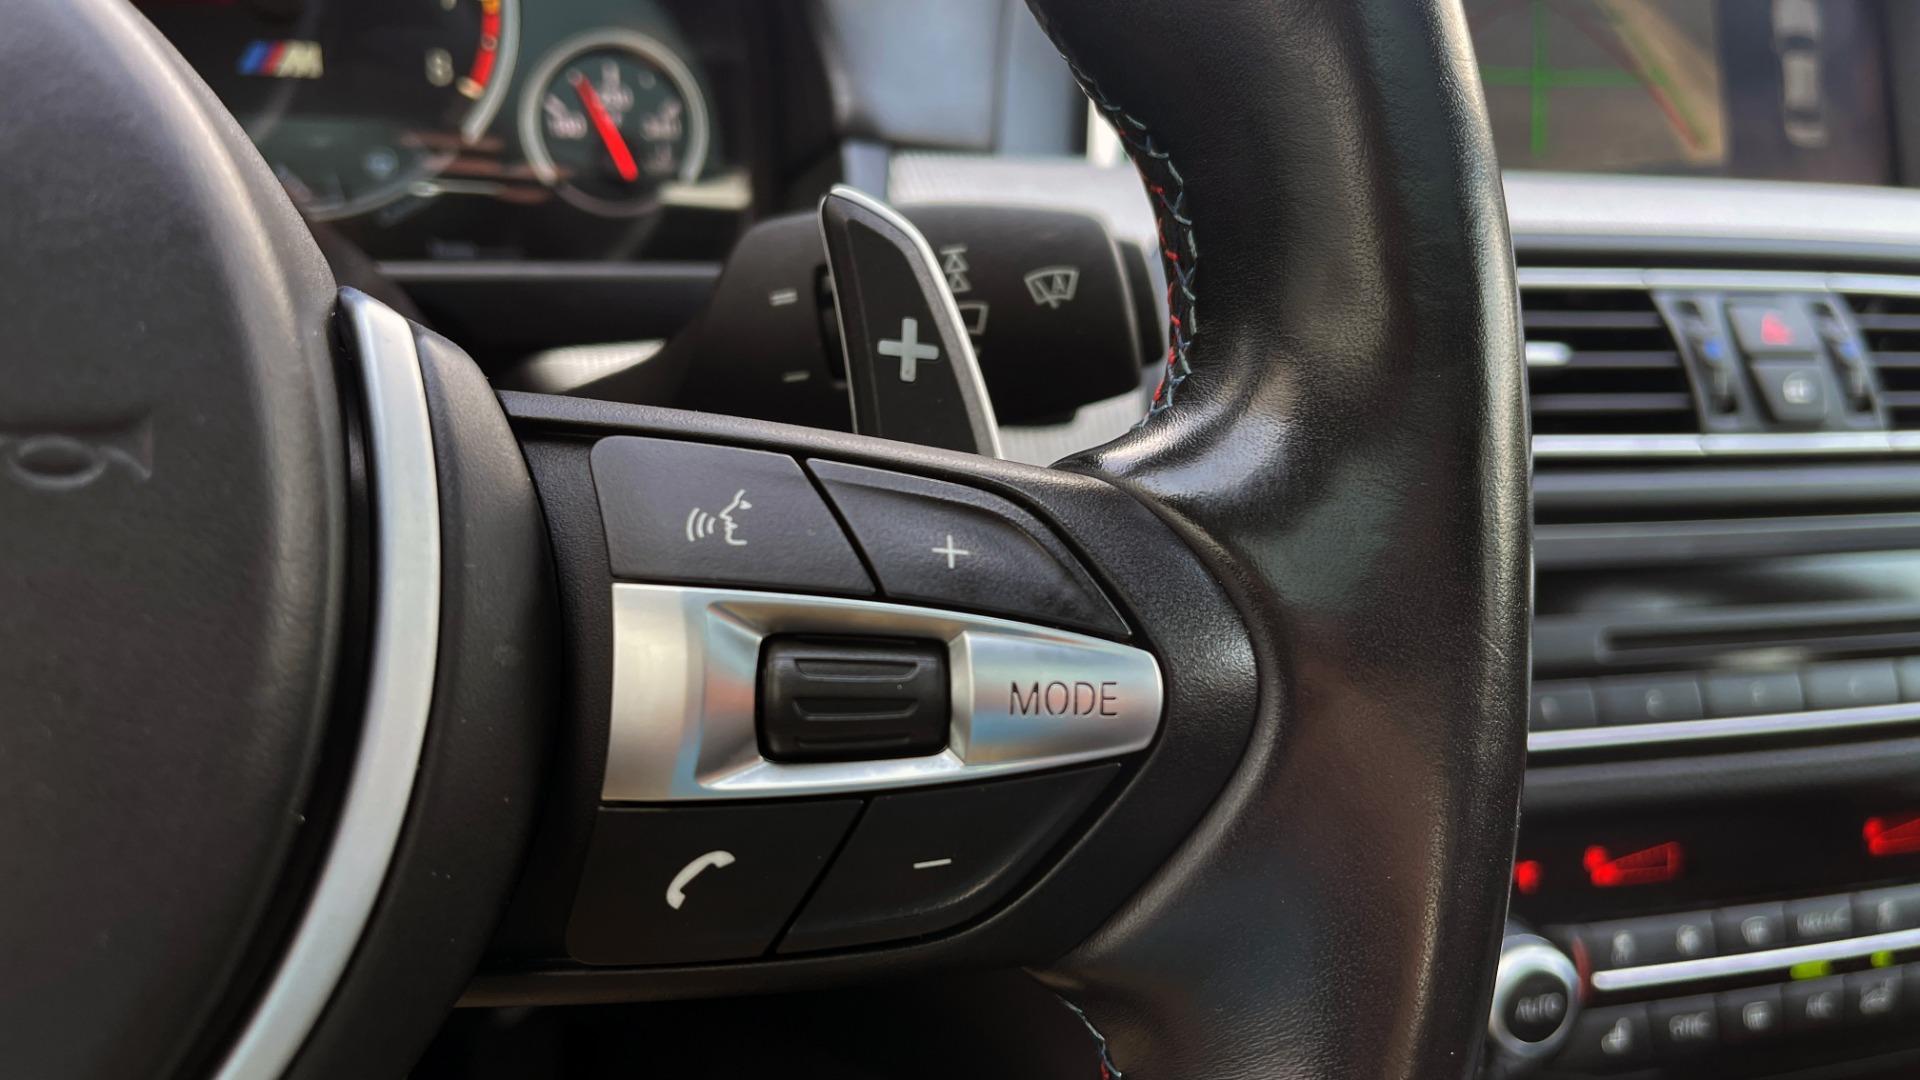 Used 2015 BMW M5 SEDAN / EXEC PKG / HUD / NAV / B&O SND / SUNROOF / REARVIEW for sale Sold at Formula Imports in Charlotte NC 28227 50